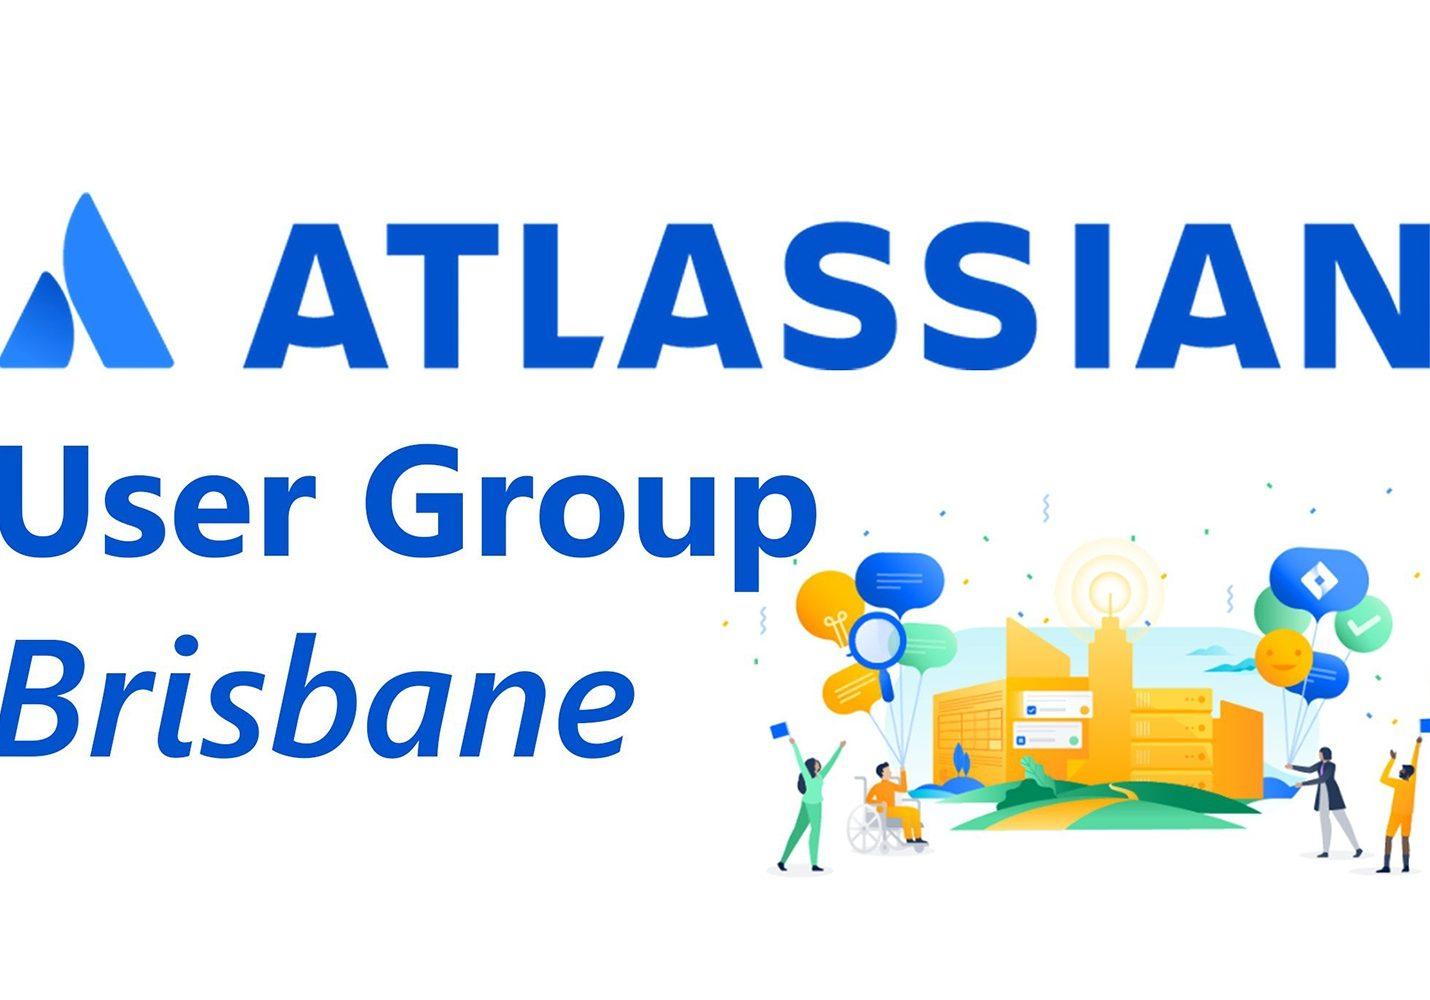 Atlassian User Group Brisbane 2019